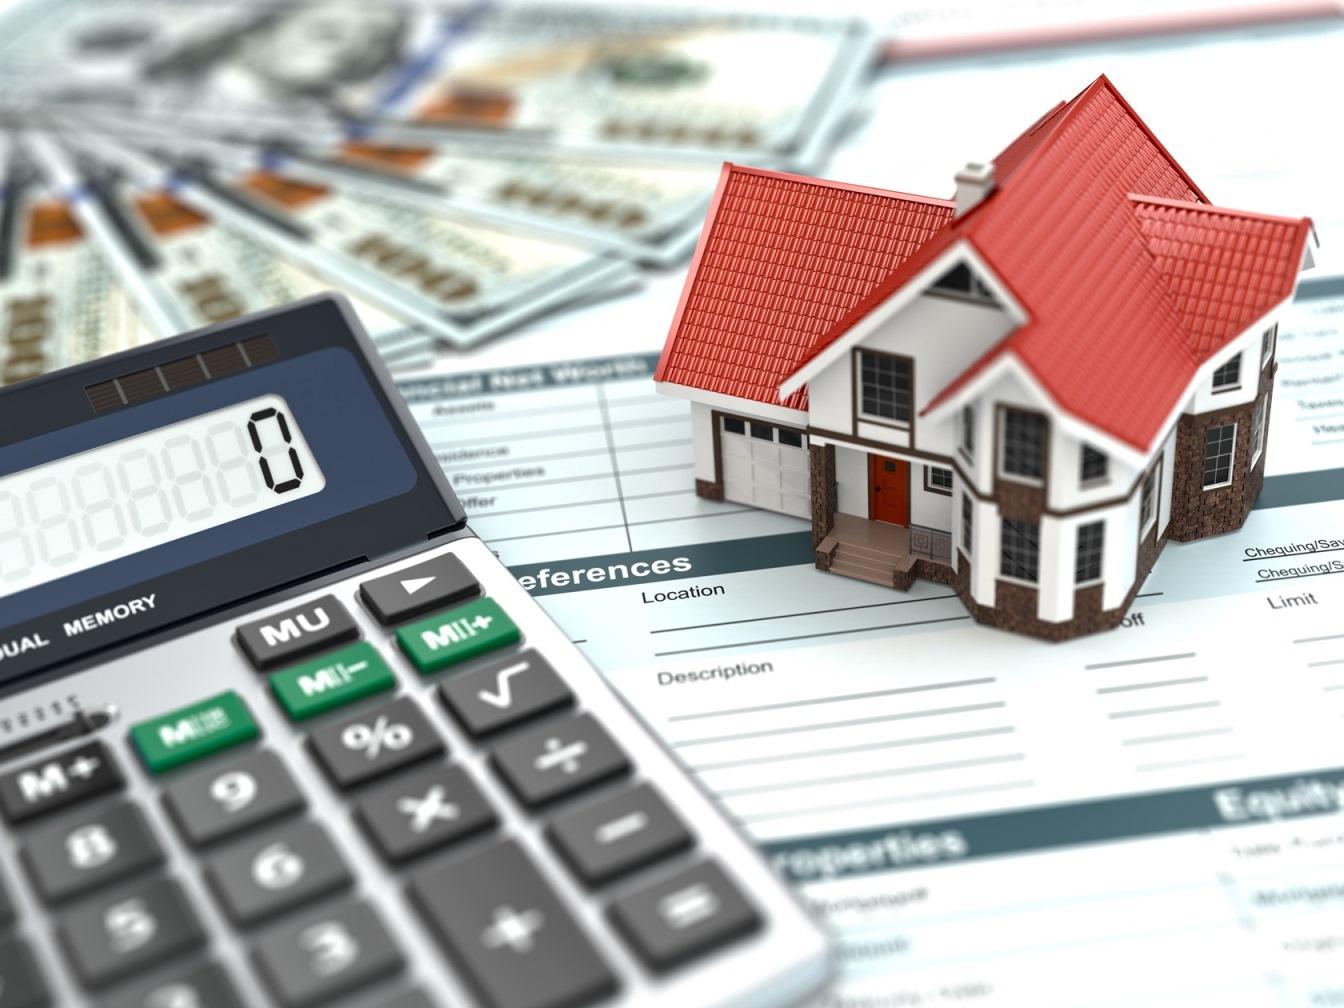 продажа недвижимости ндфл